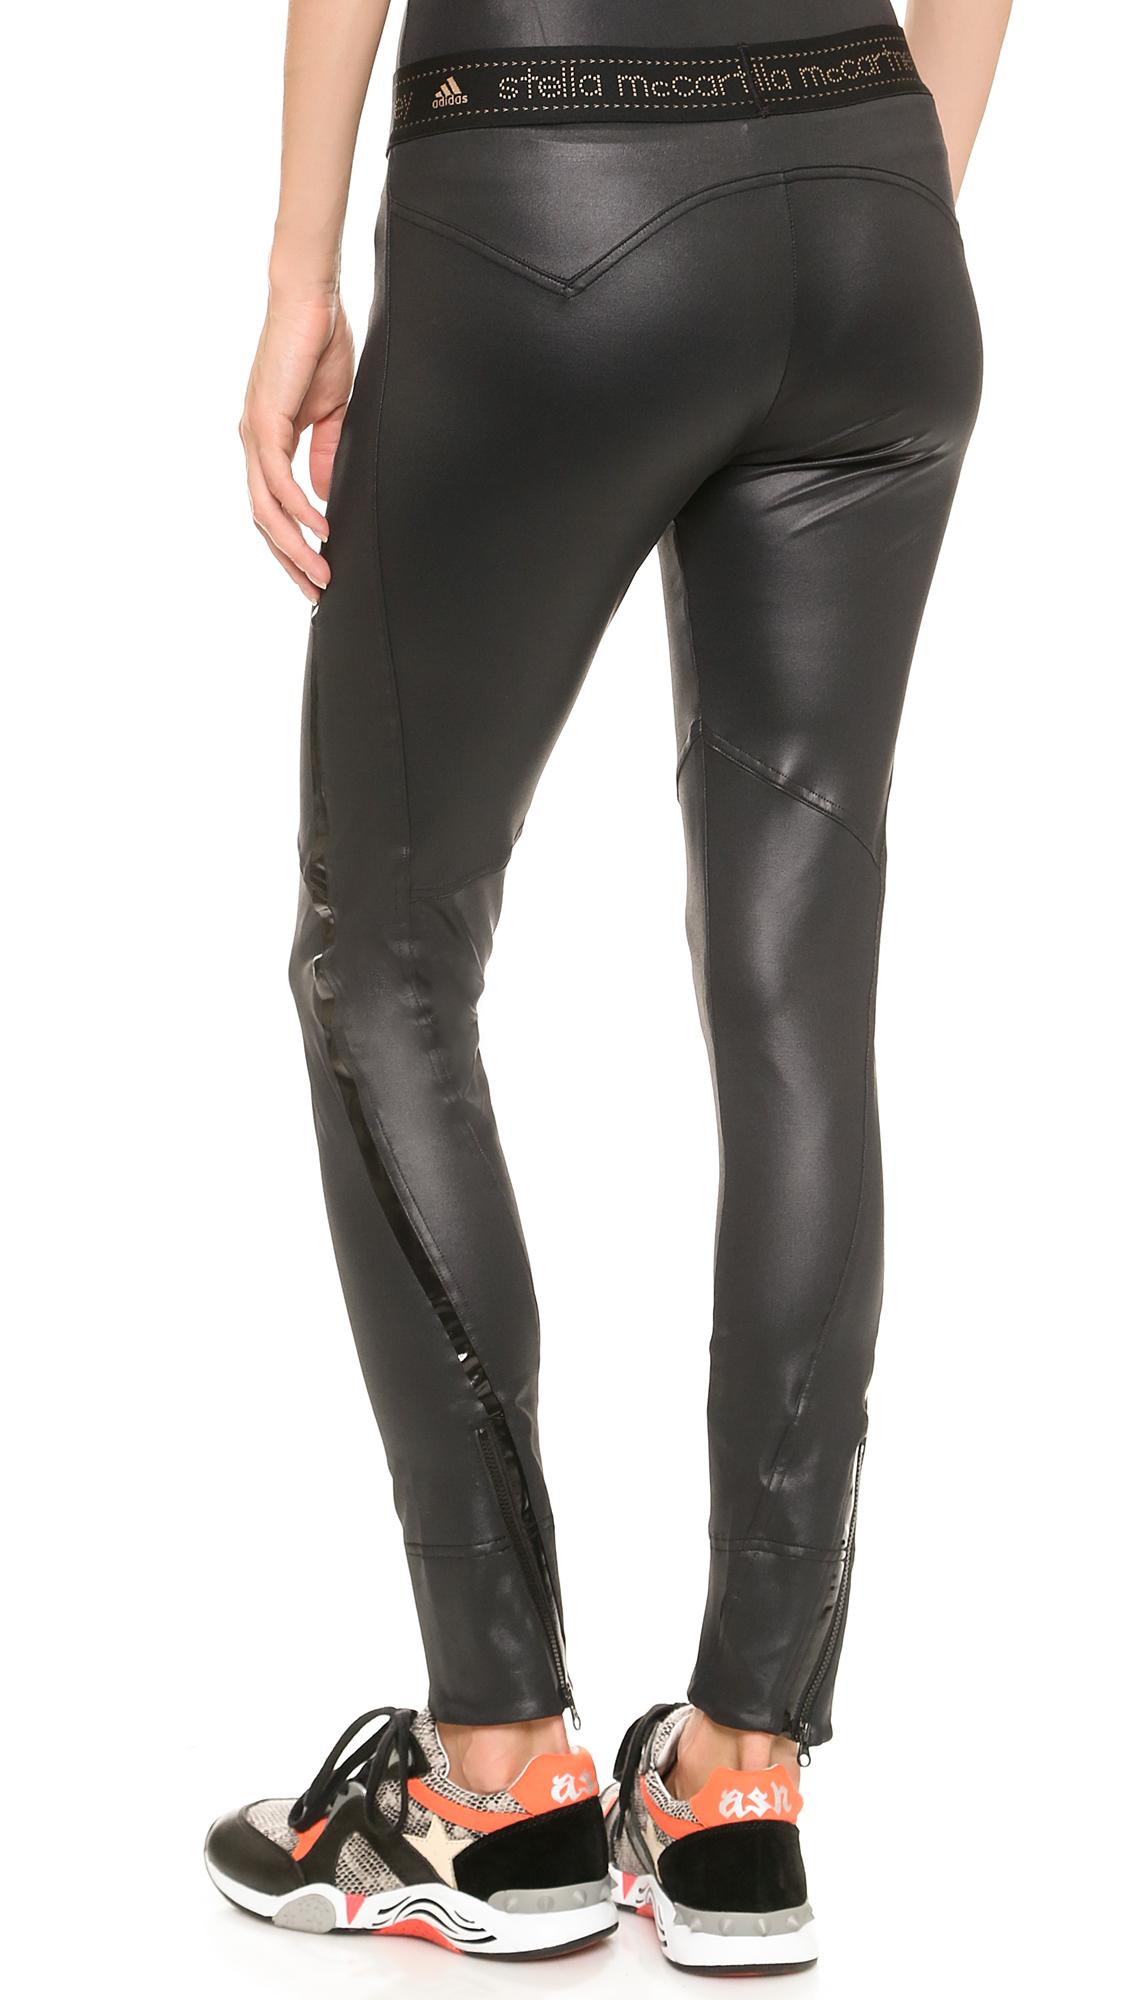 Mccartney Leggings Adidas Stella By Tight Performance Lyst Running qg7t0P7f